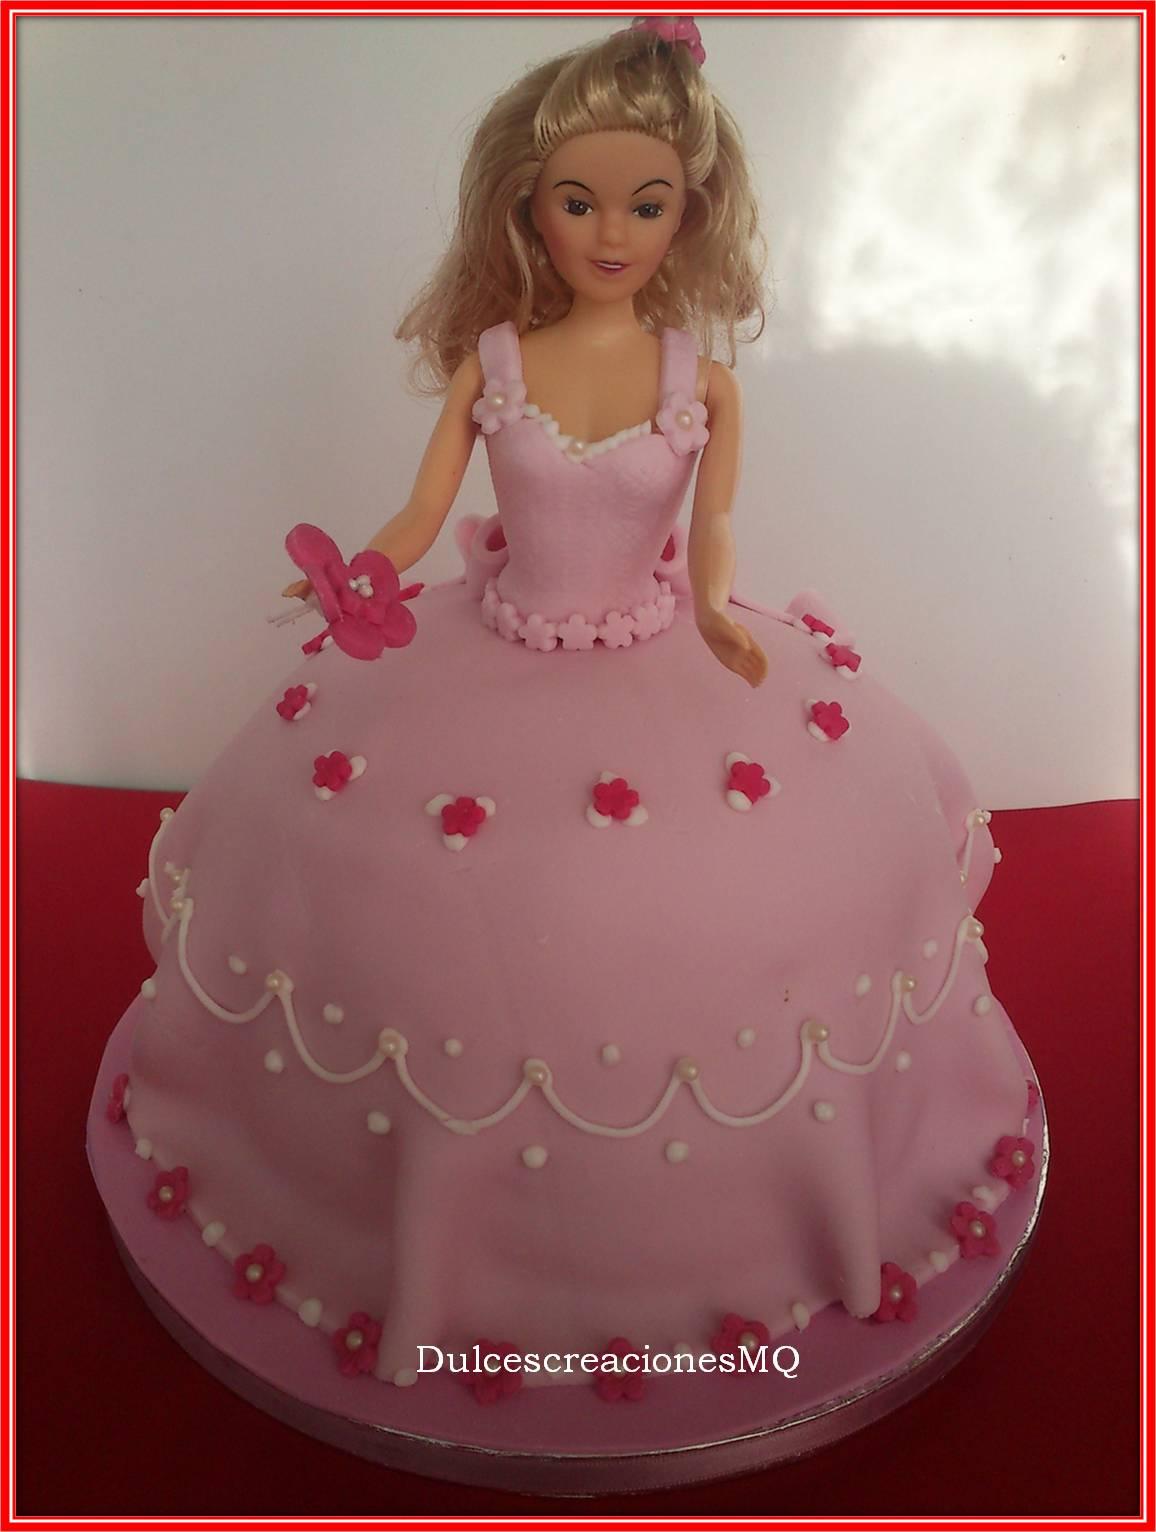 Bizcocho Victoria Sponge Cake Pastel Tarta Princesa Fondant Cumpleaños Niña Rosa Muñeca Vestido Buttercream Fruta de la Pasión Chocolate